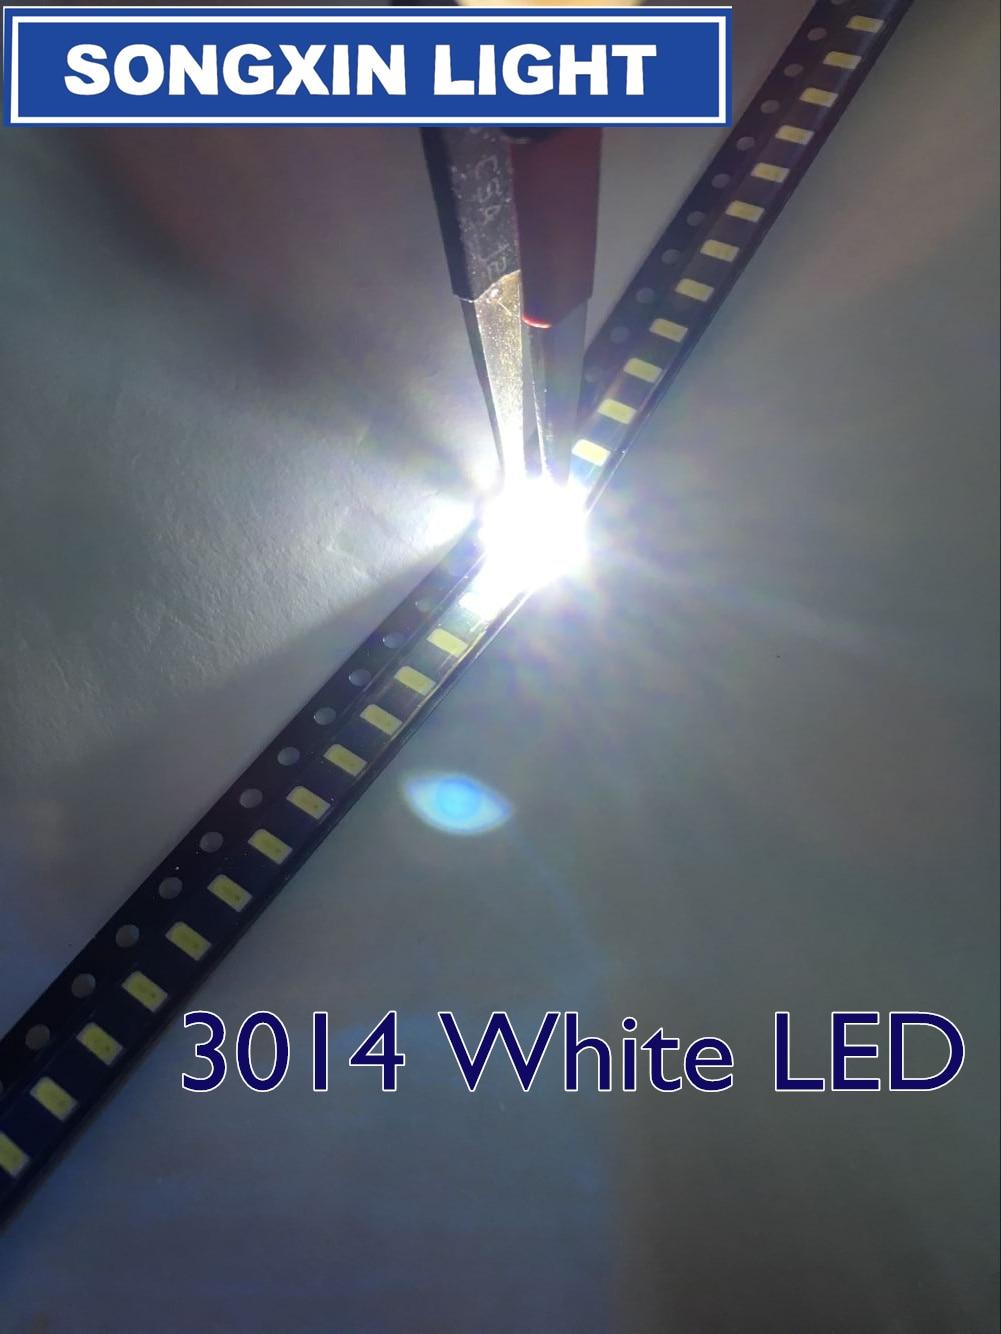 100 pces smd 3014 led 0.1 w 10-12lm 6000-6500 k branco 3014 smd led grânulos 3014 diodos cw